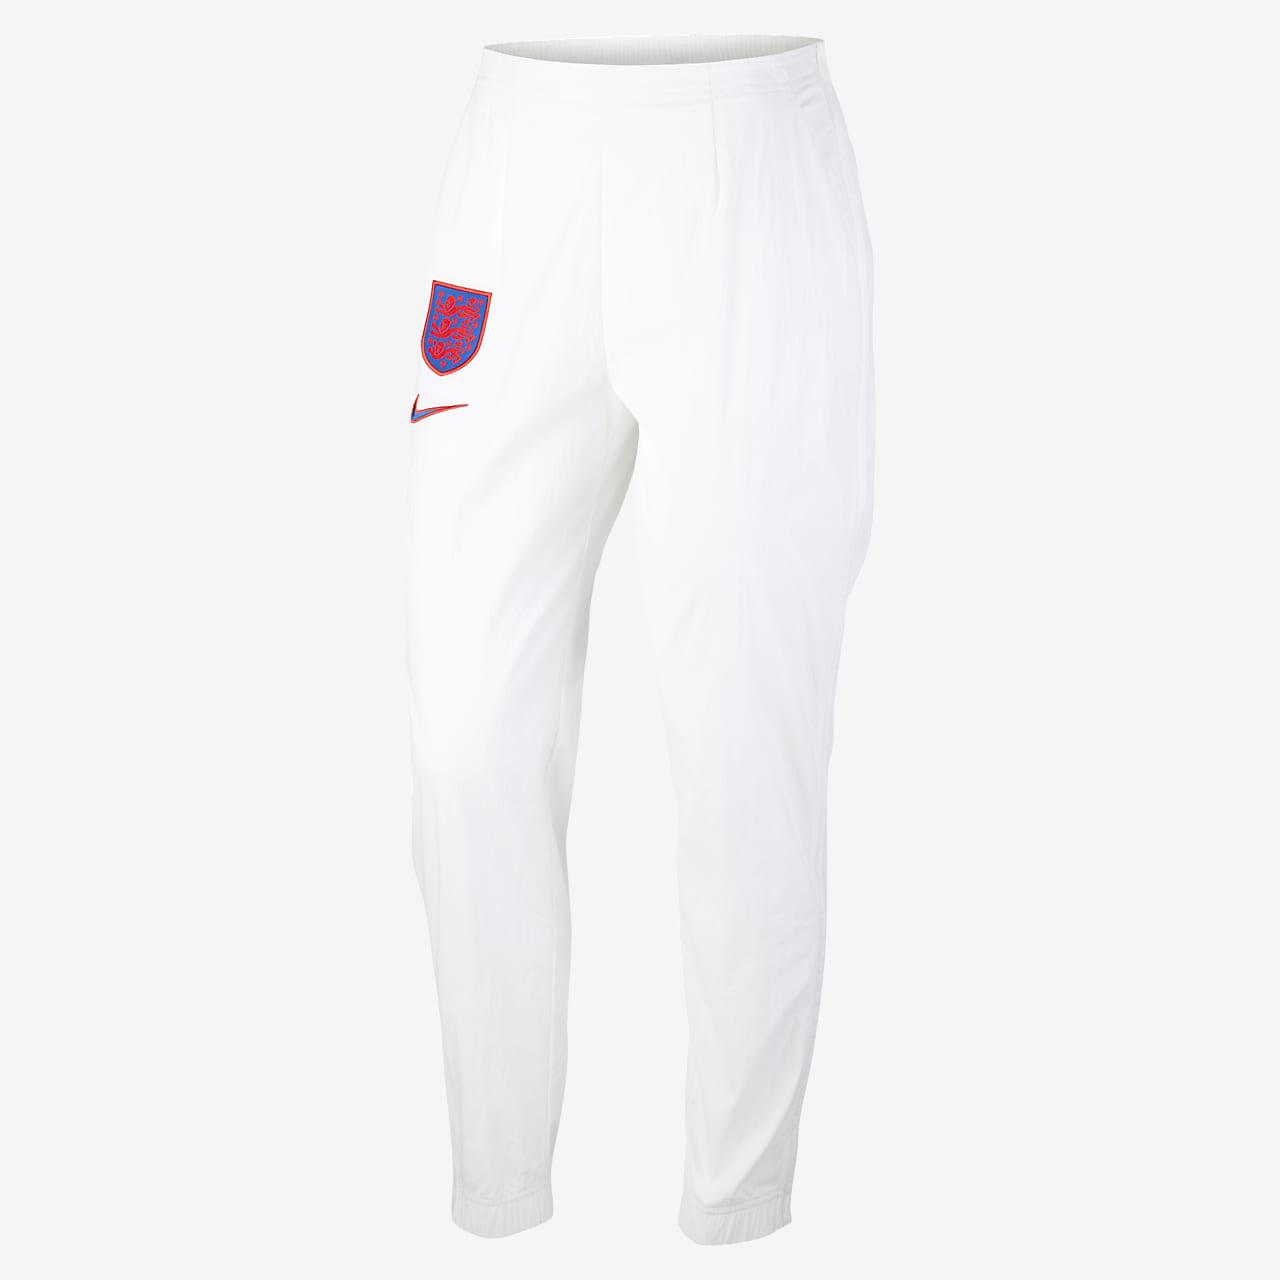 England Women's Woven Football Trousers